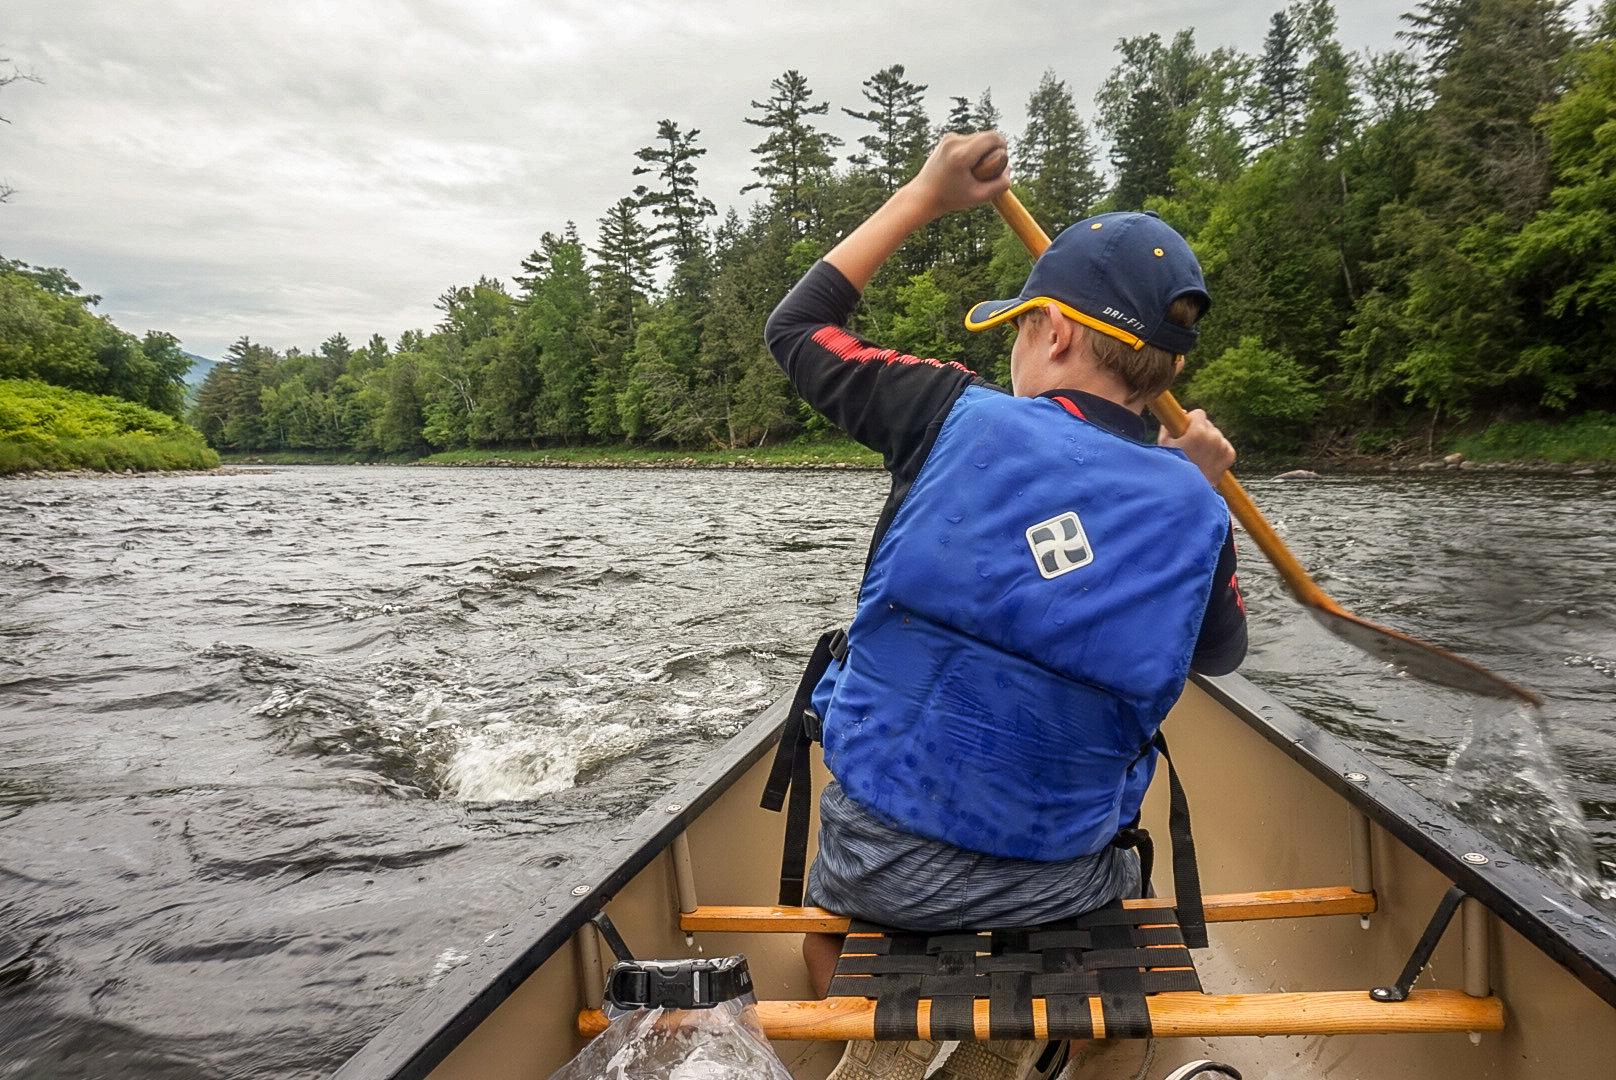 Connecticut River Canoe Adventure